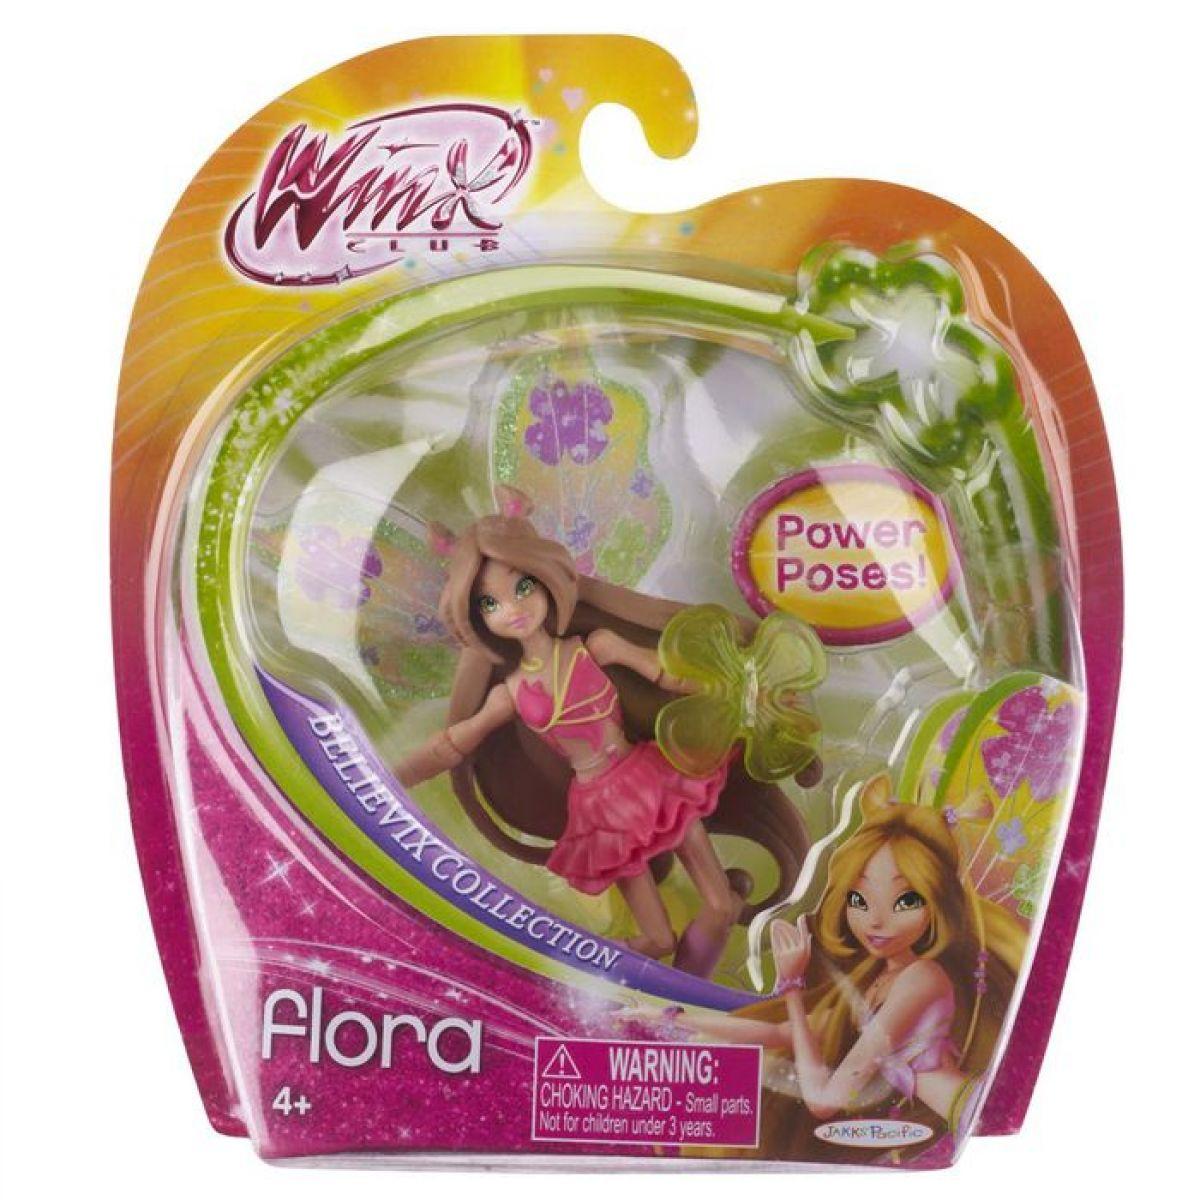 WinX Believix Action Dolls - Aisha